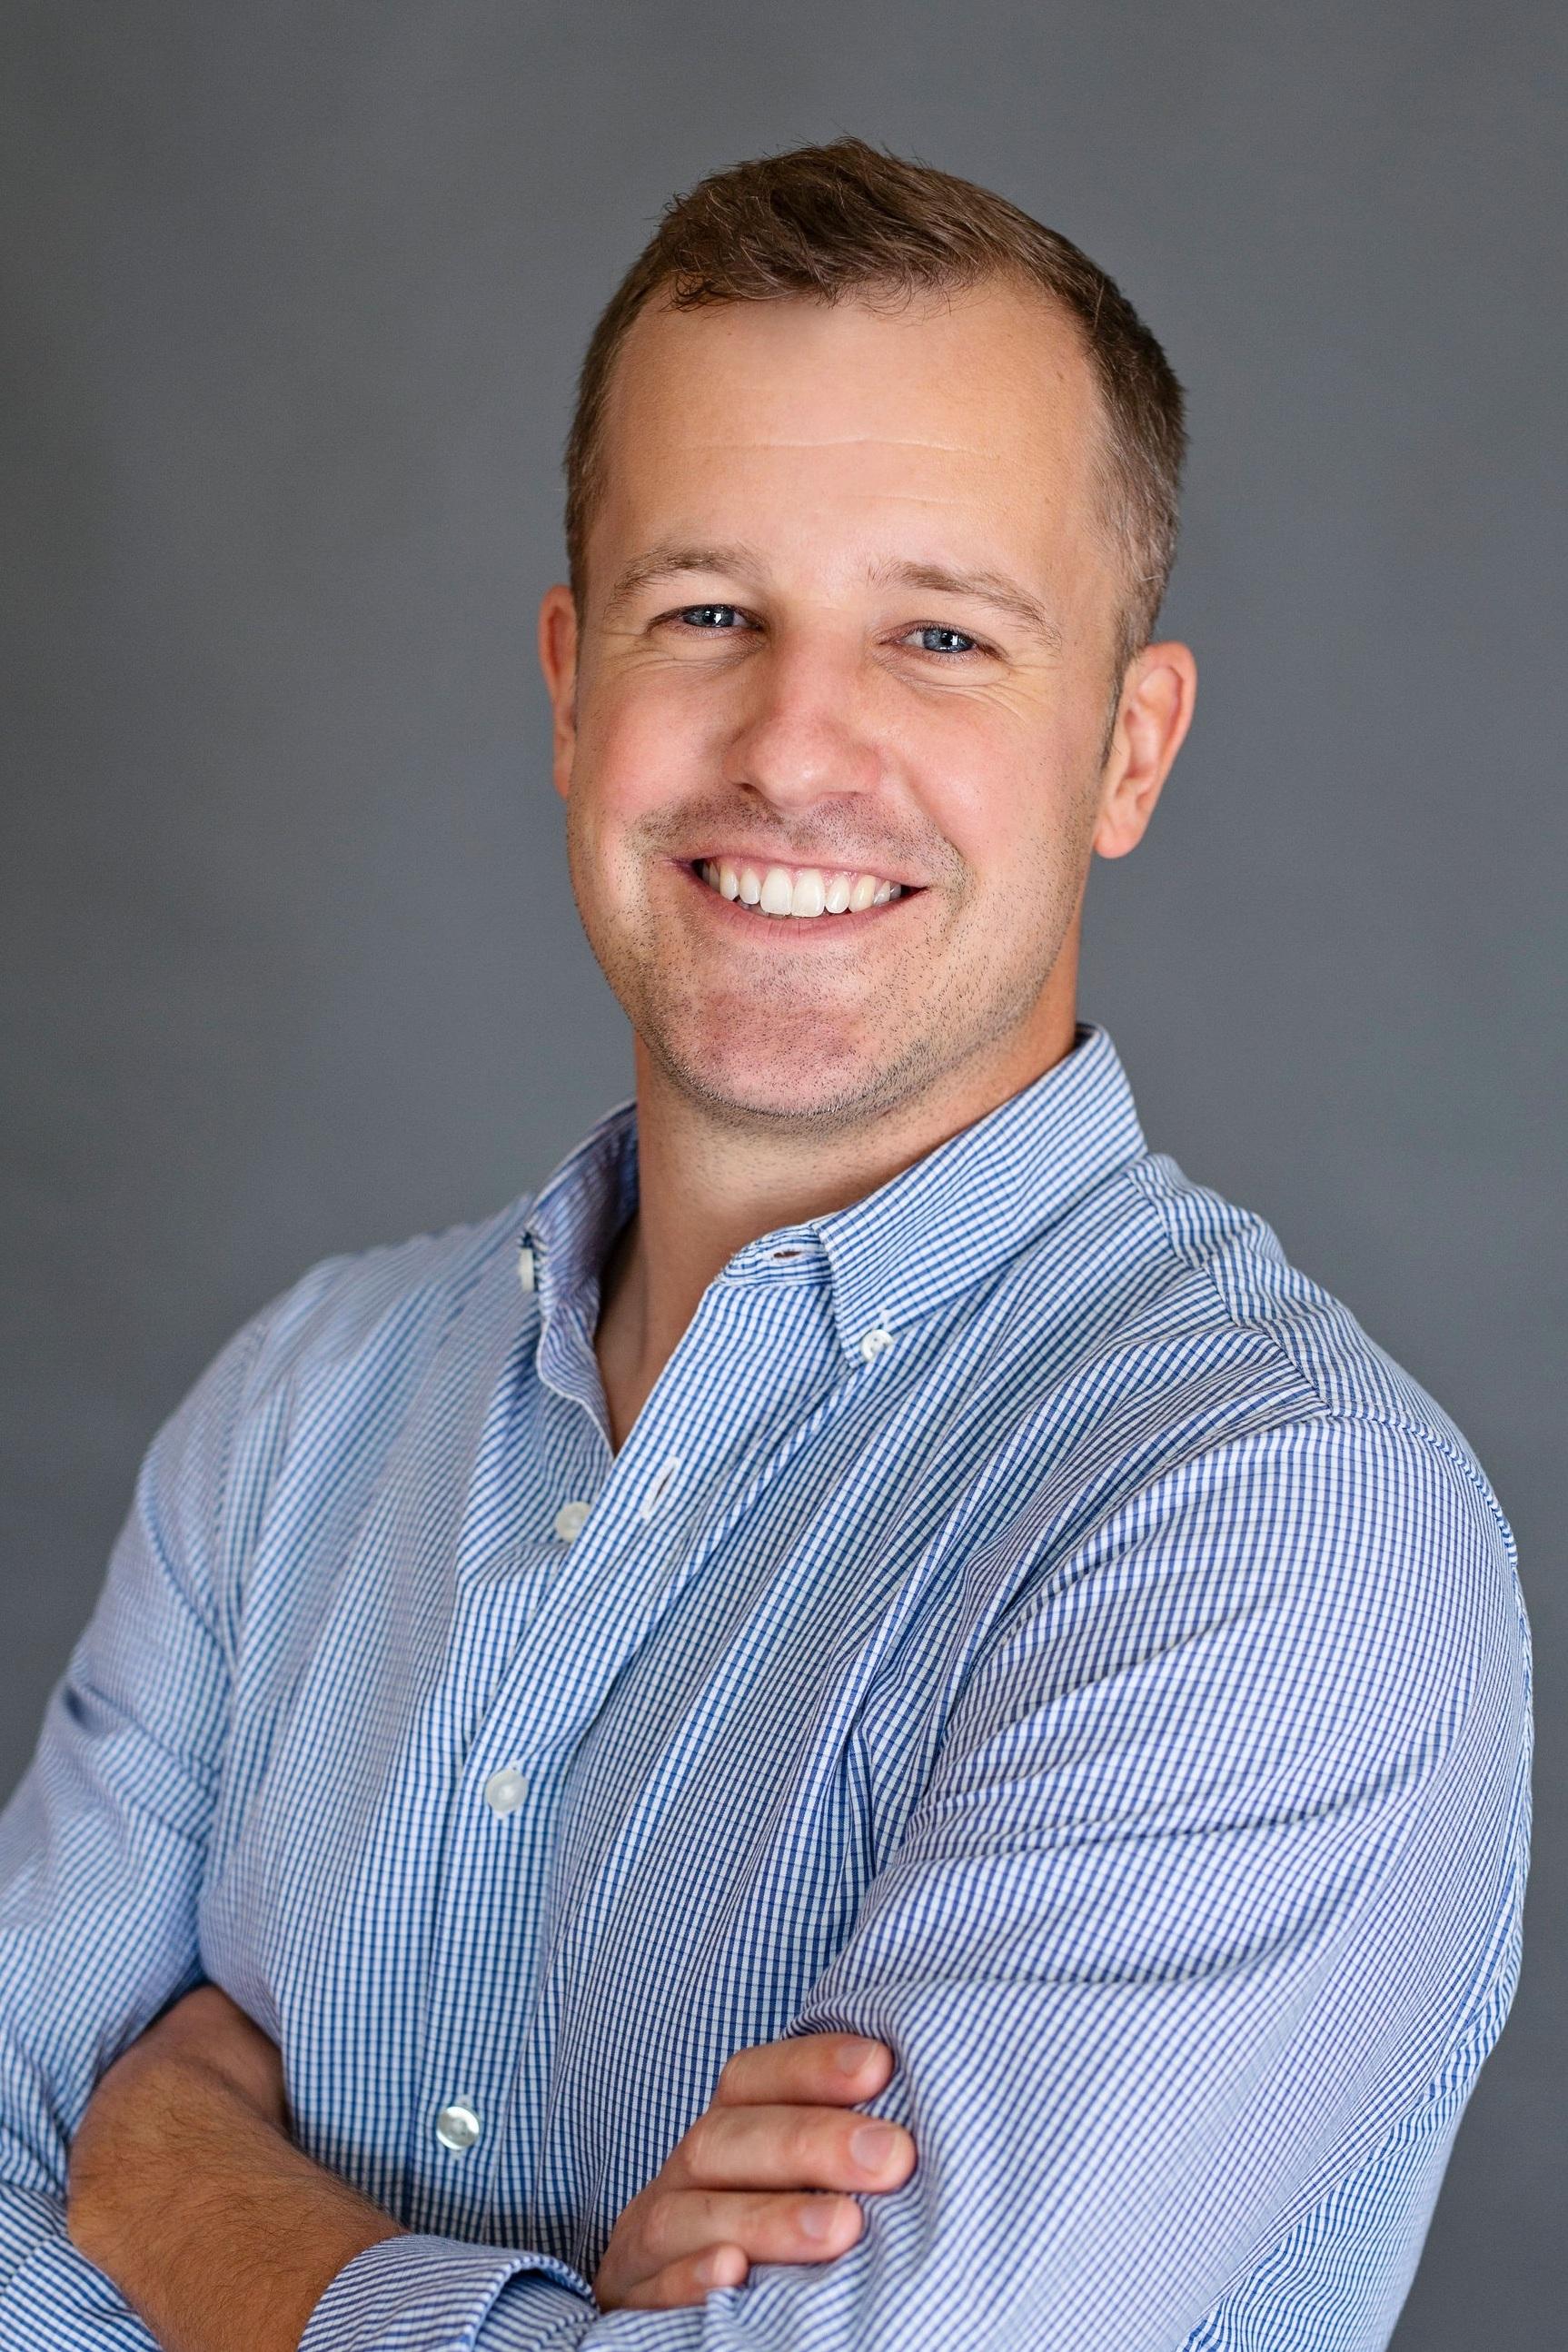 David Warren - Operations Manager